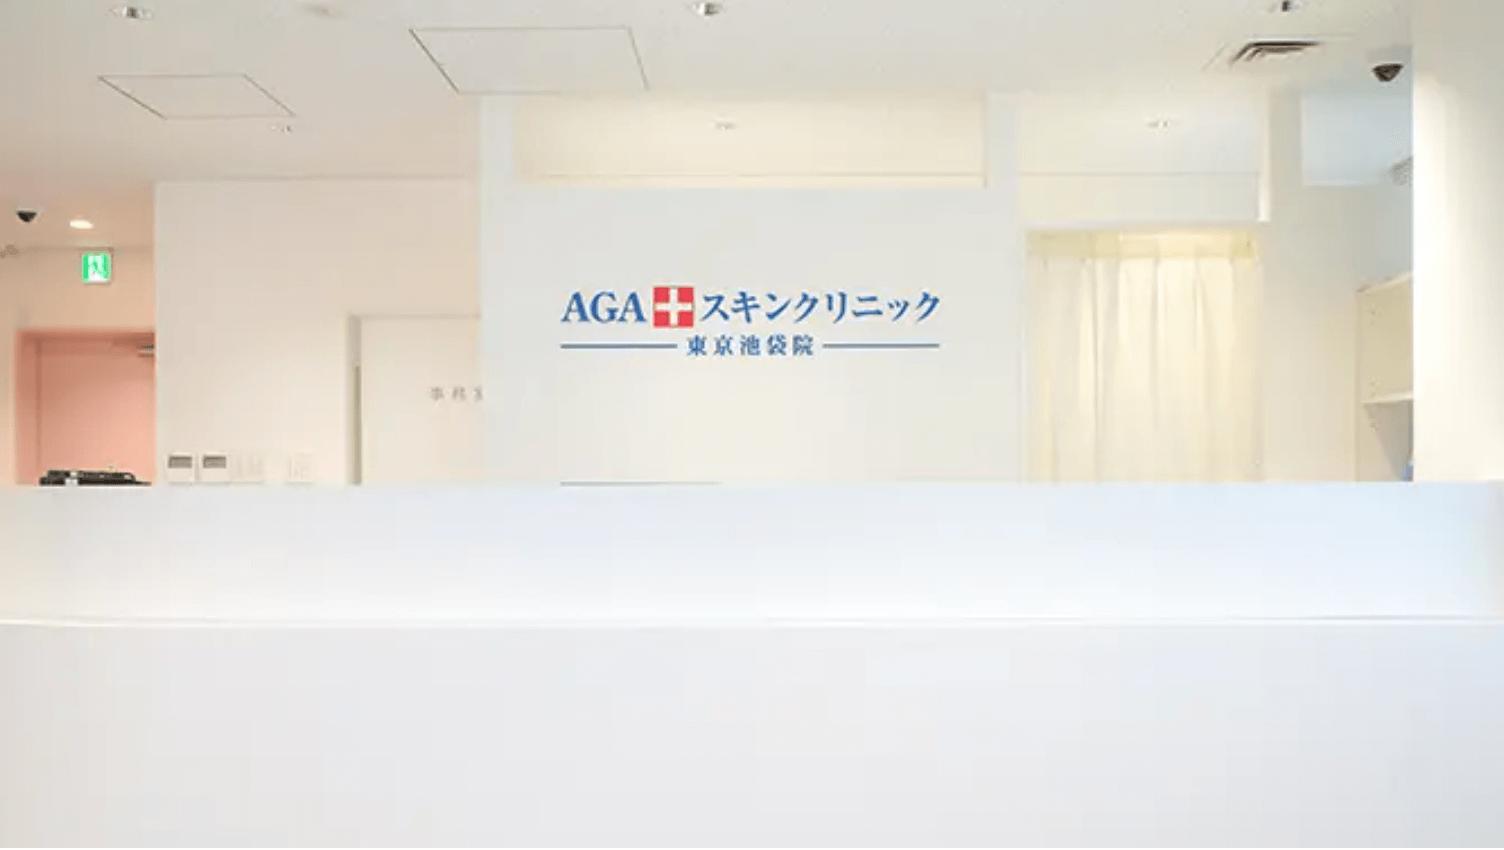 AGAスキンクリニックの受付イメージ